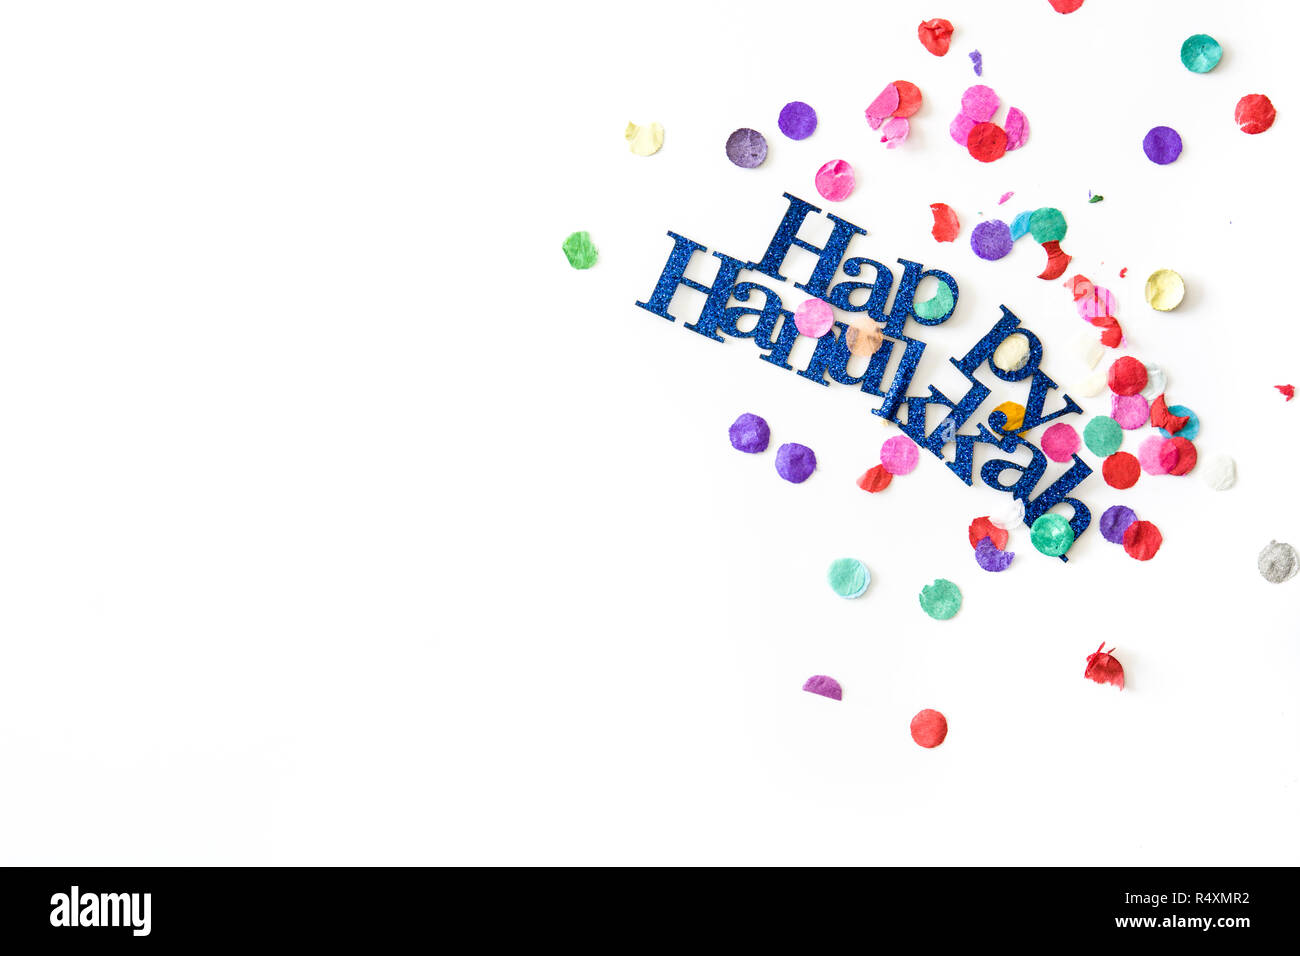 Happy Hanukkah and confetti background. Copyspace - Stock Image